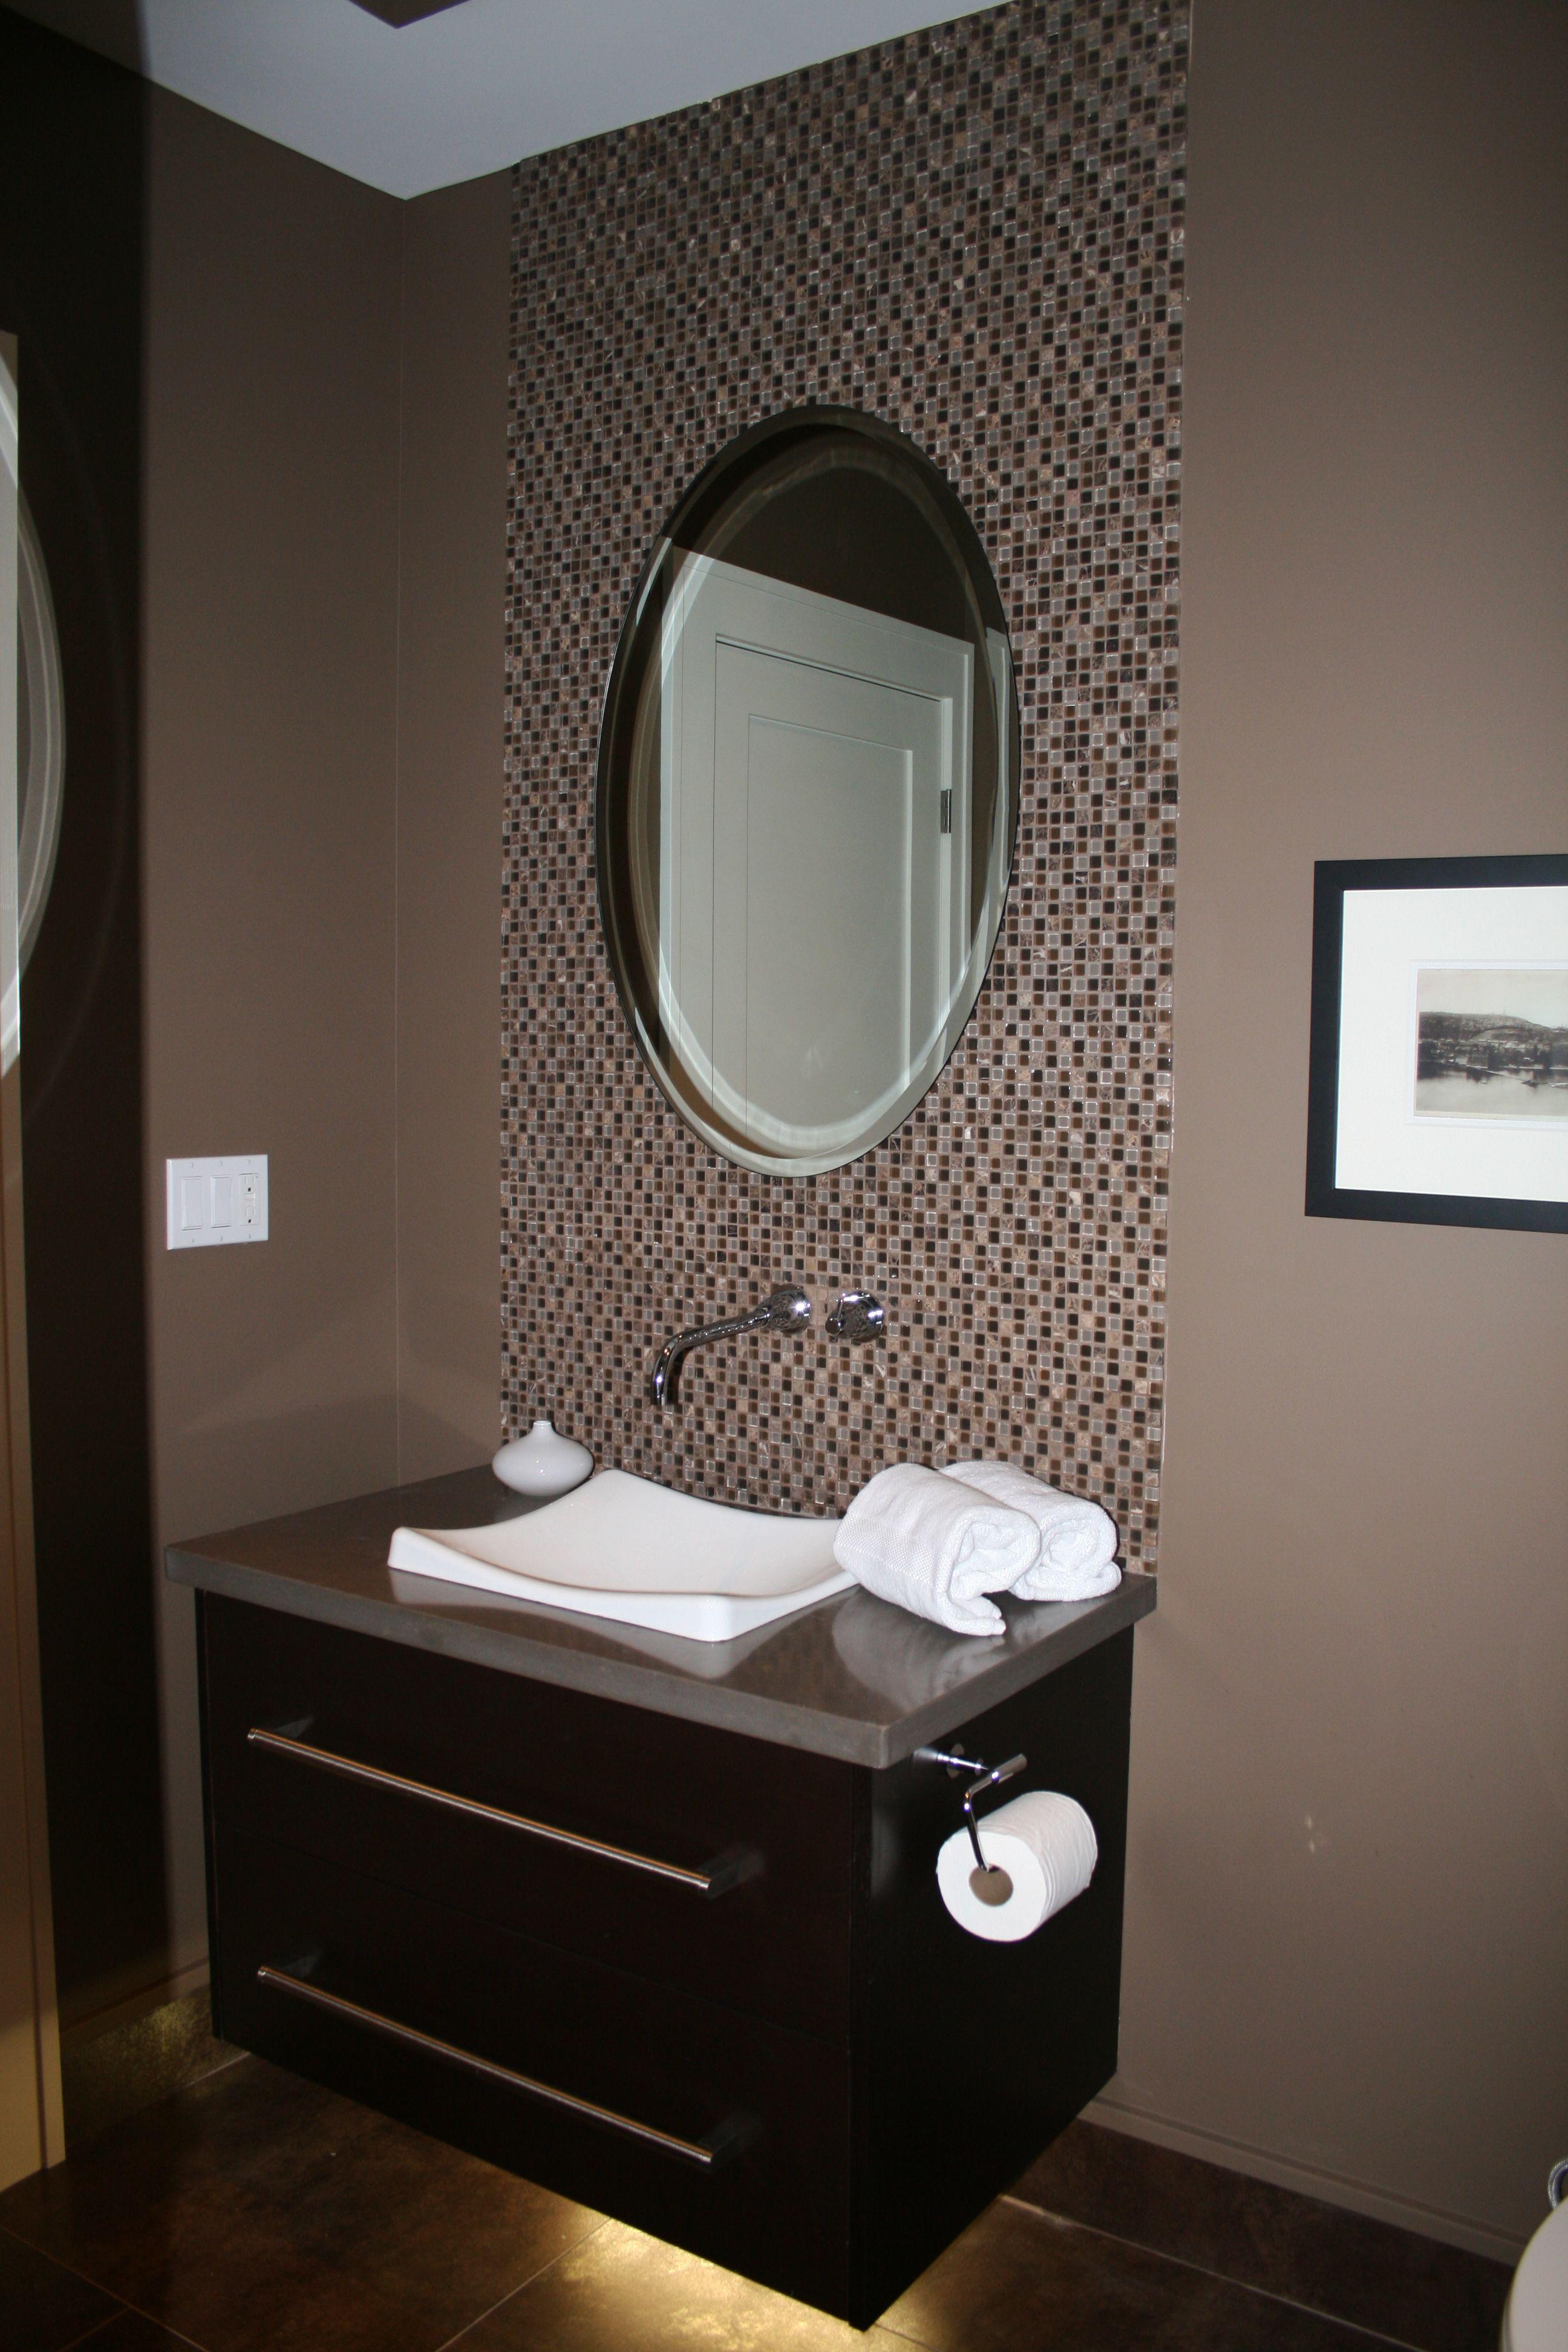 Qc modern bathroom vanity remodel idea book pinterest